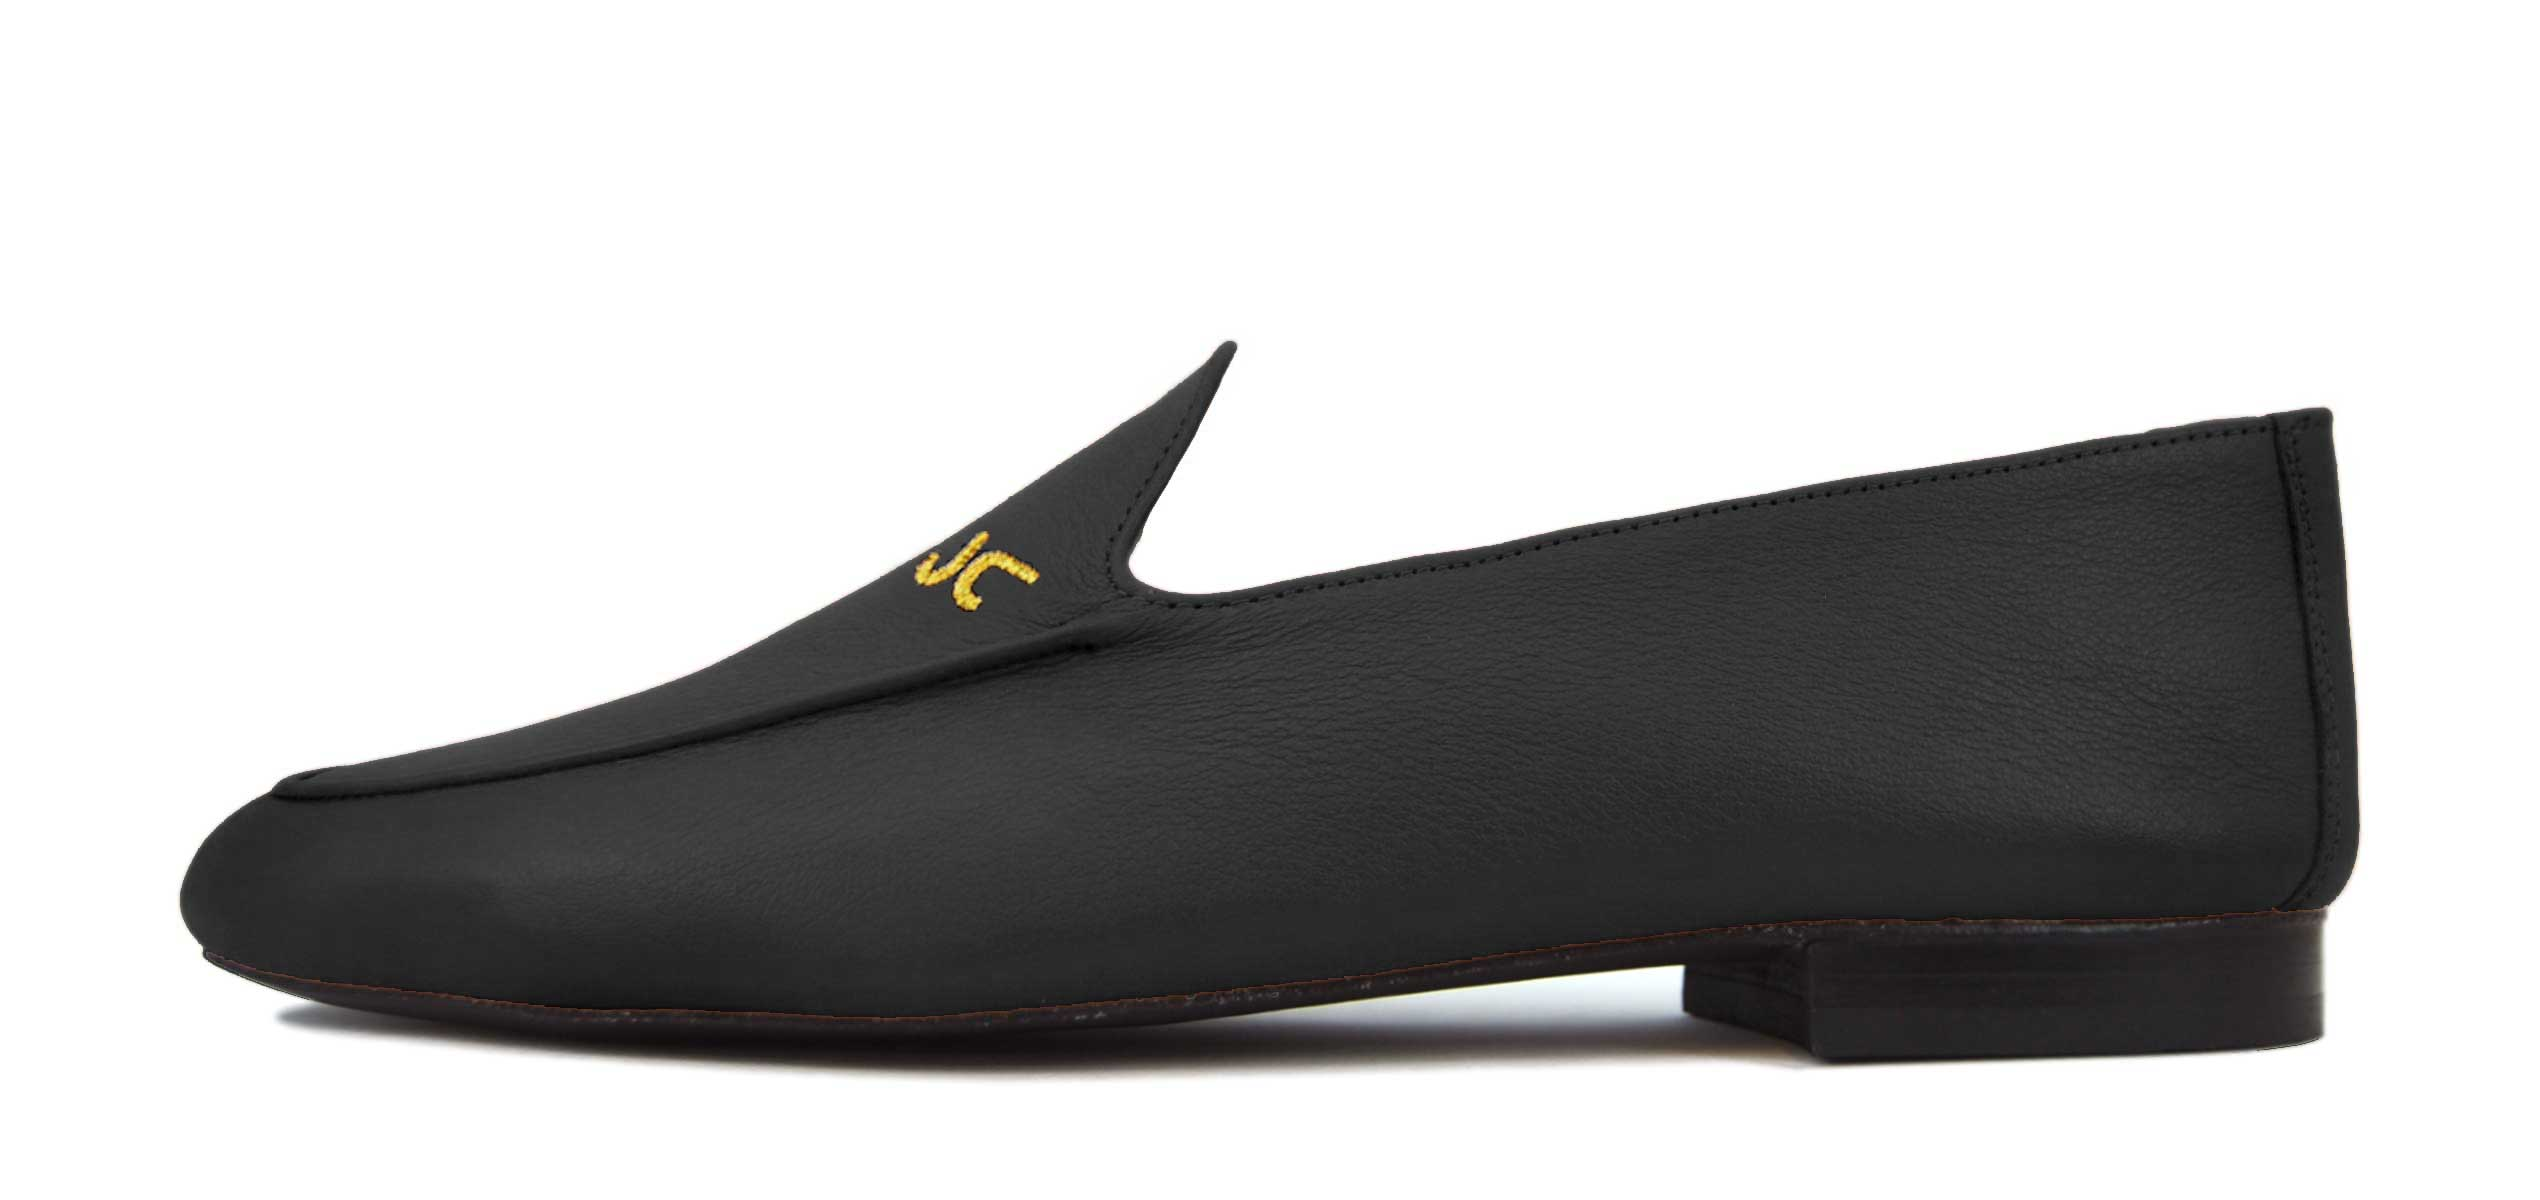 Foto 1 de Zapatos Julio Iglesias 528 JC Graphite Piel Napa